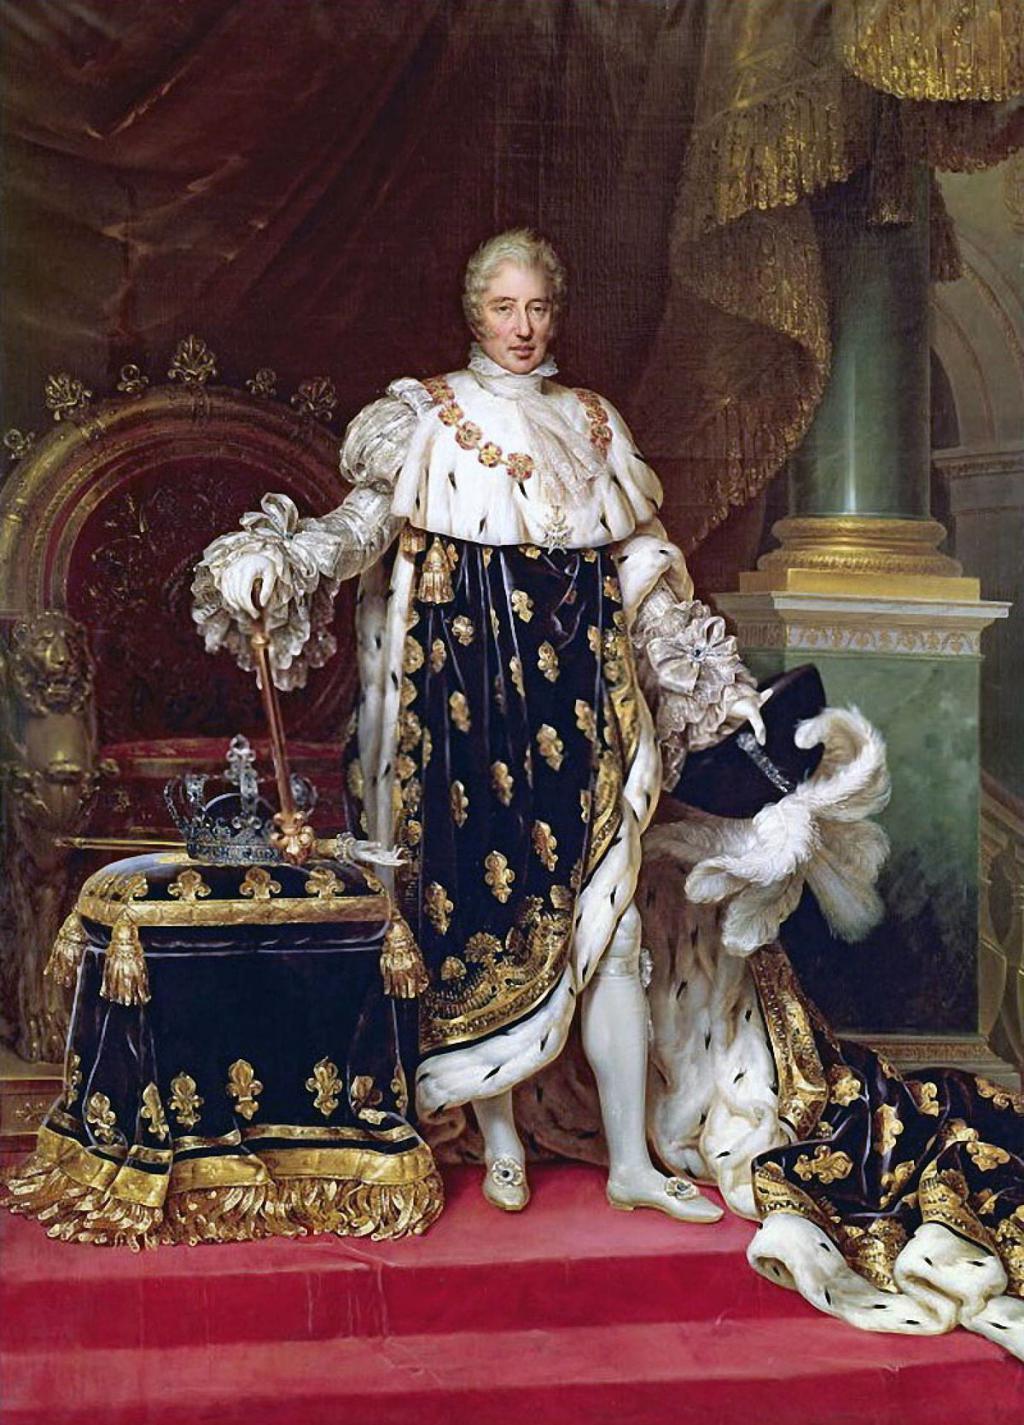 Théses et Articles Charles_x_roi_de_..._navarre-54a3812